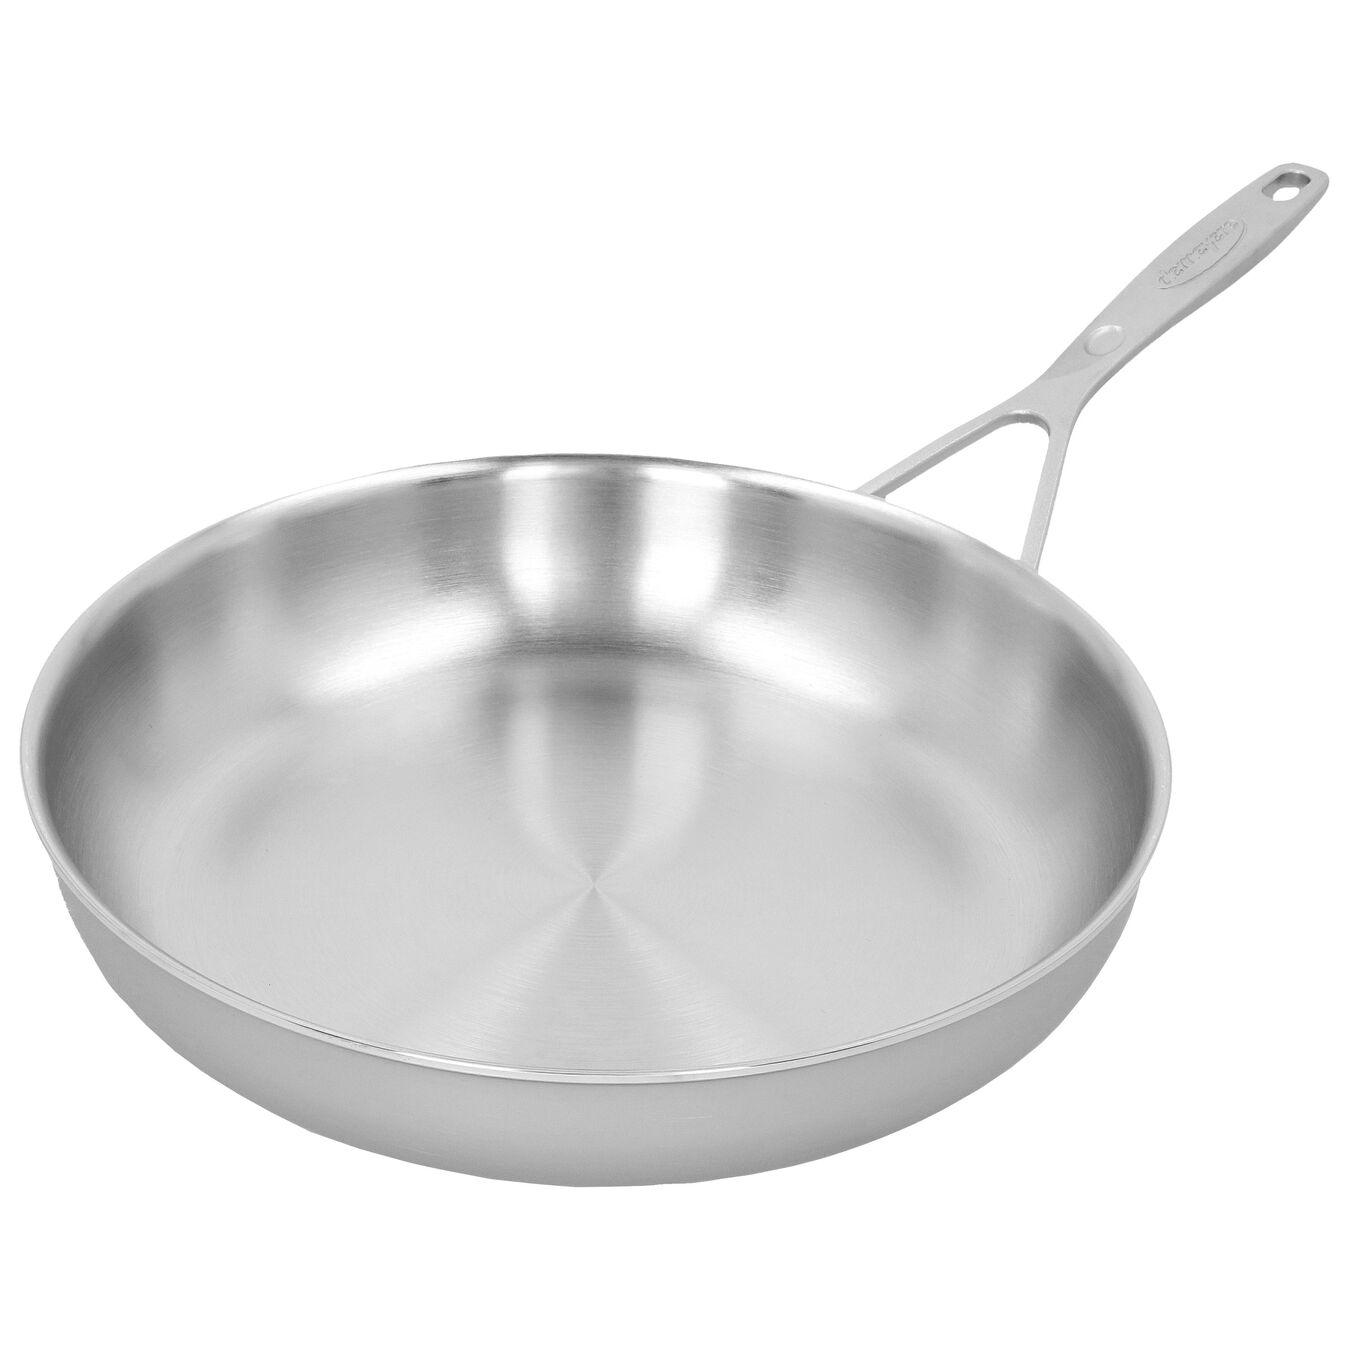 28 cm / 11 inch Frying pan,,large 3